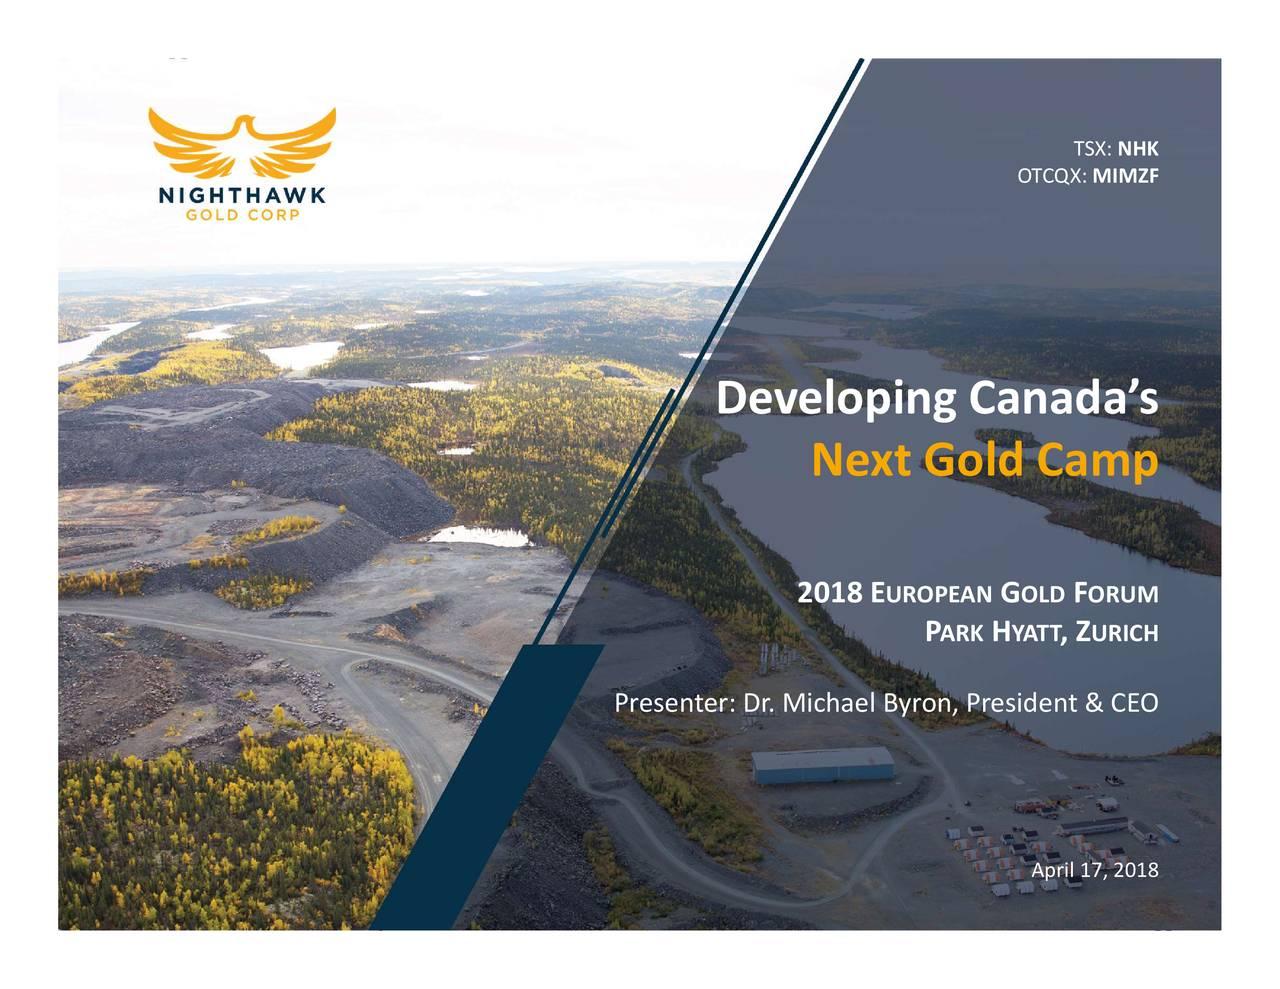 Nighthawk Gold (MIMZF) Presents At European Gold Forum